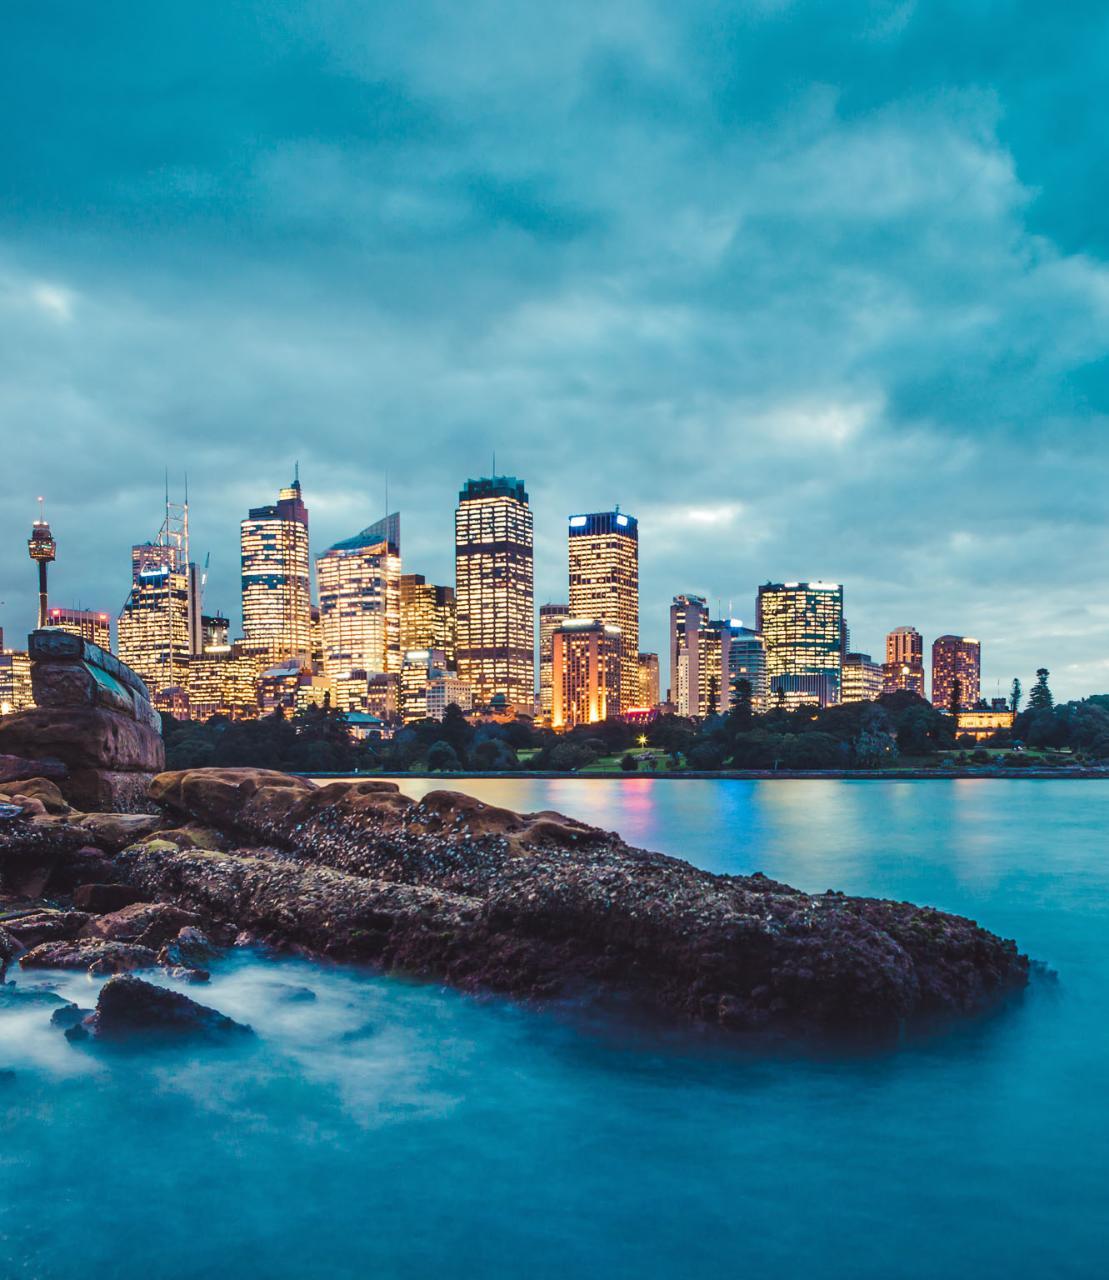 Sydney Private Photography Workshop